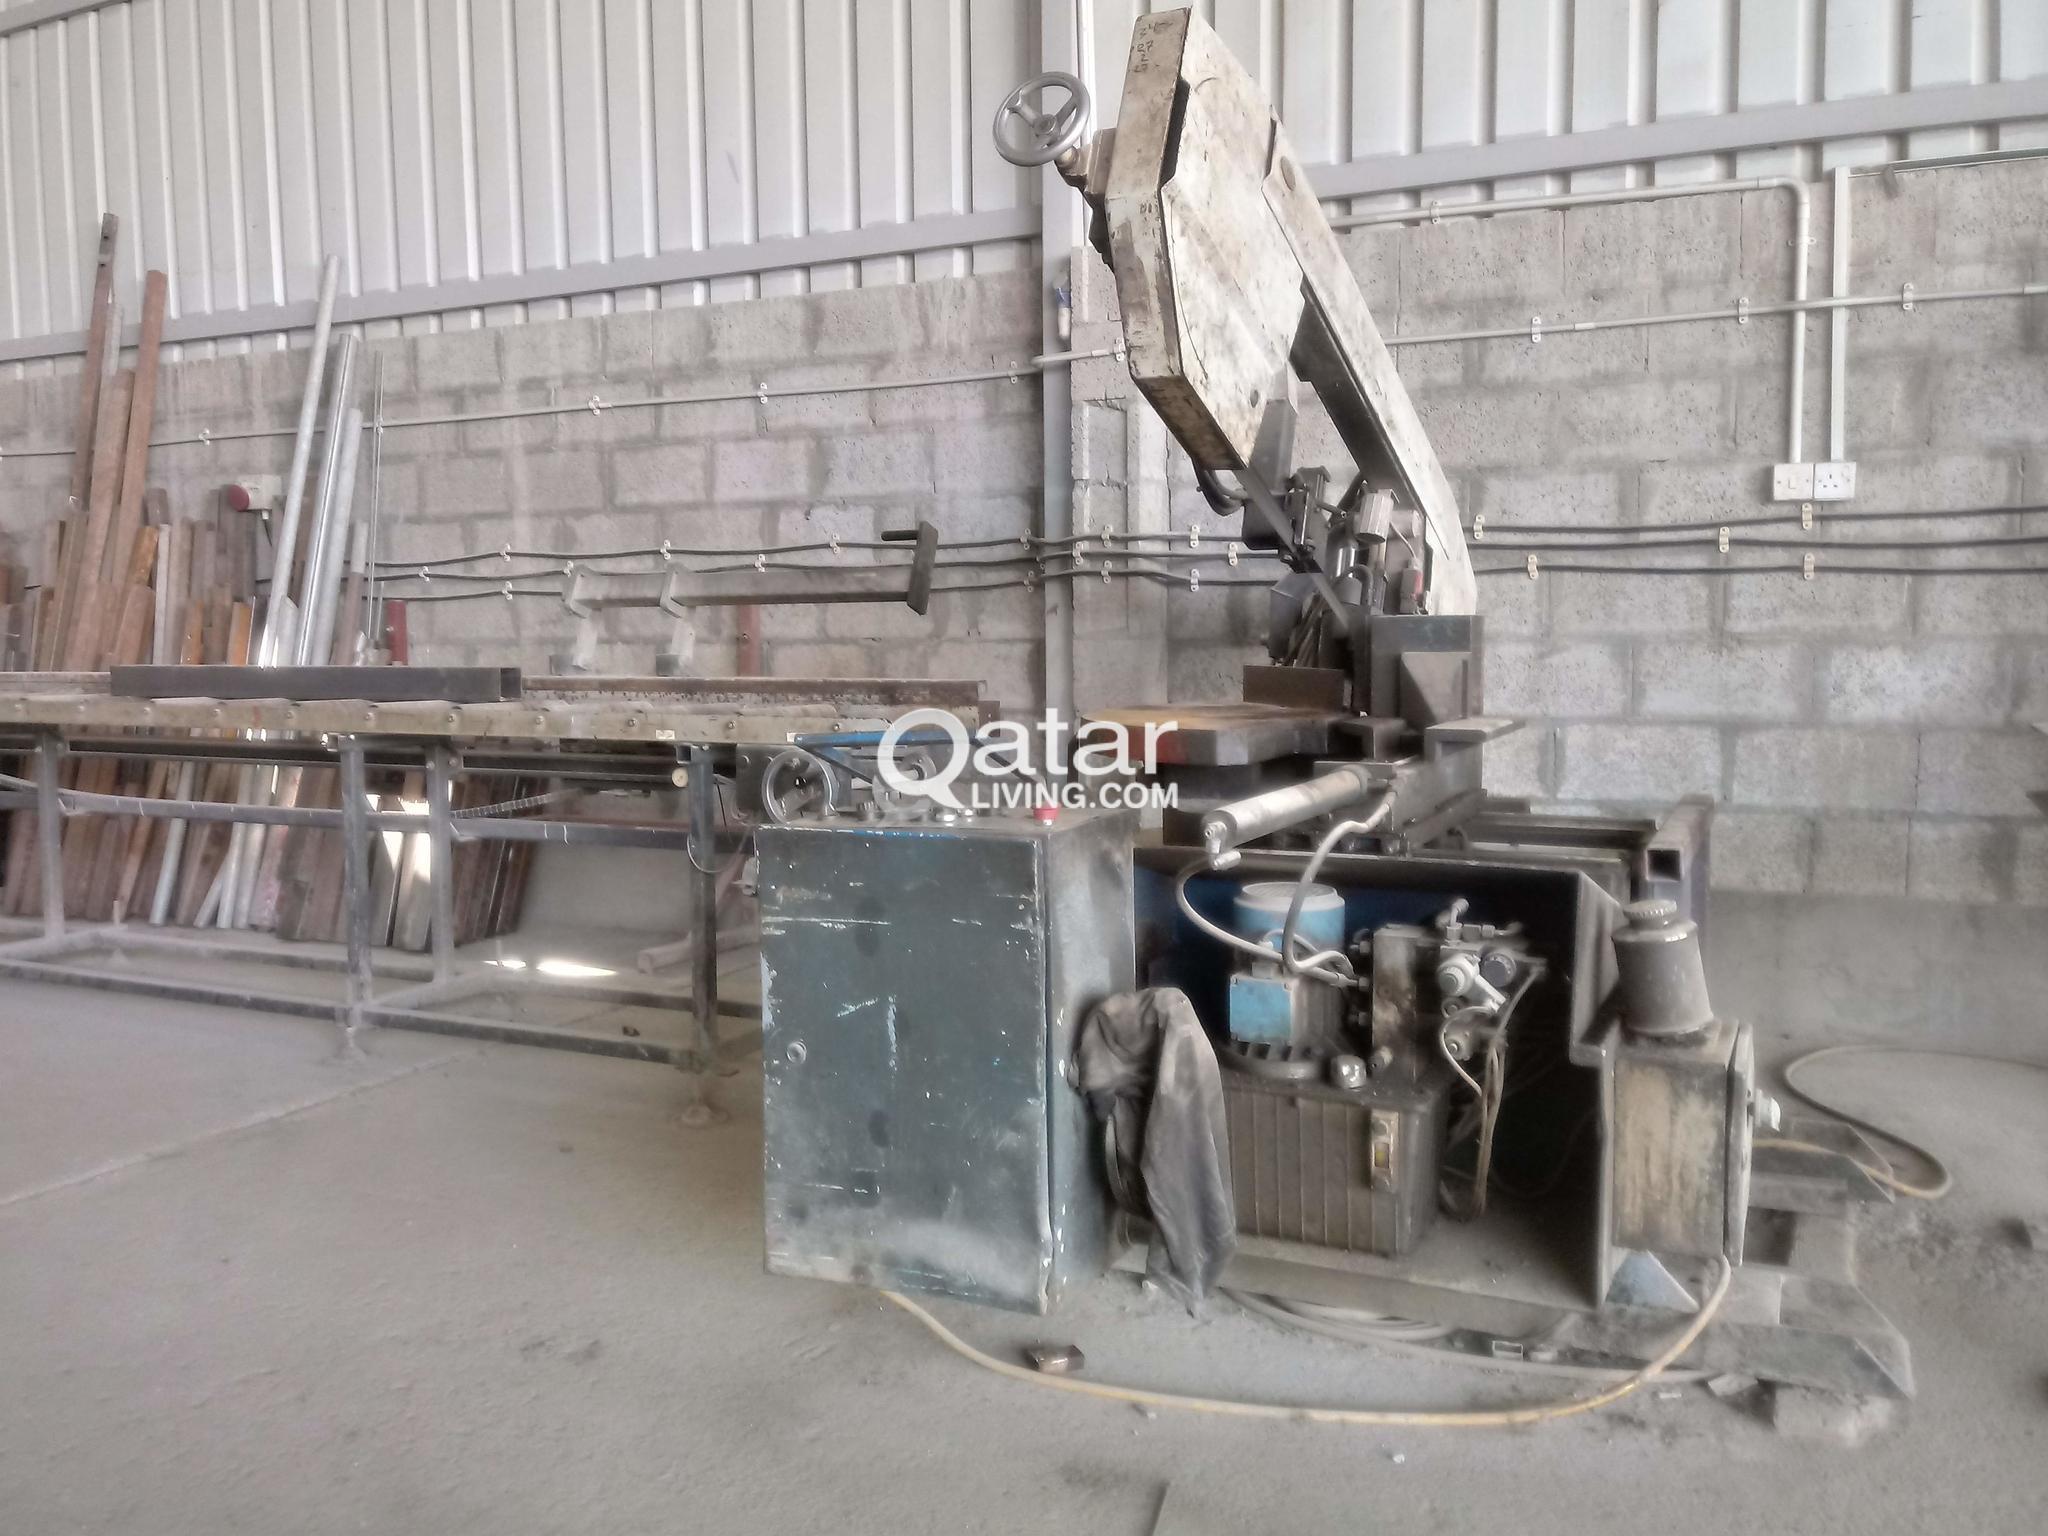 Metal Cutting Band Saw Machine | Qatar Living